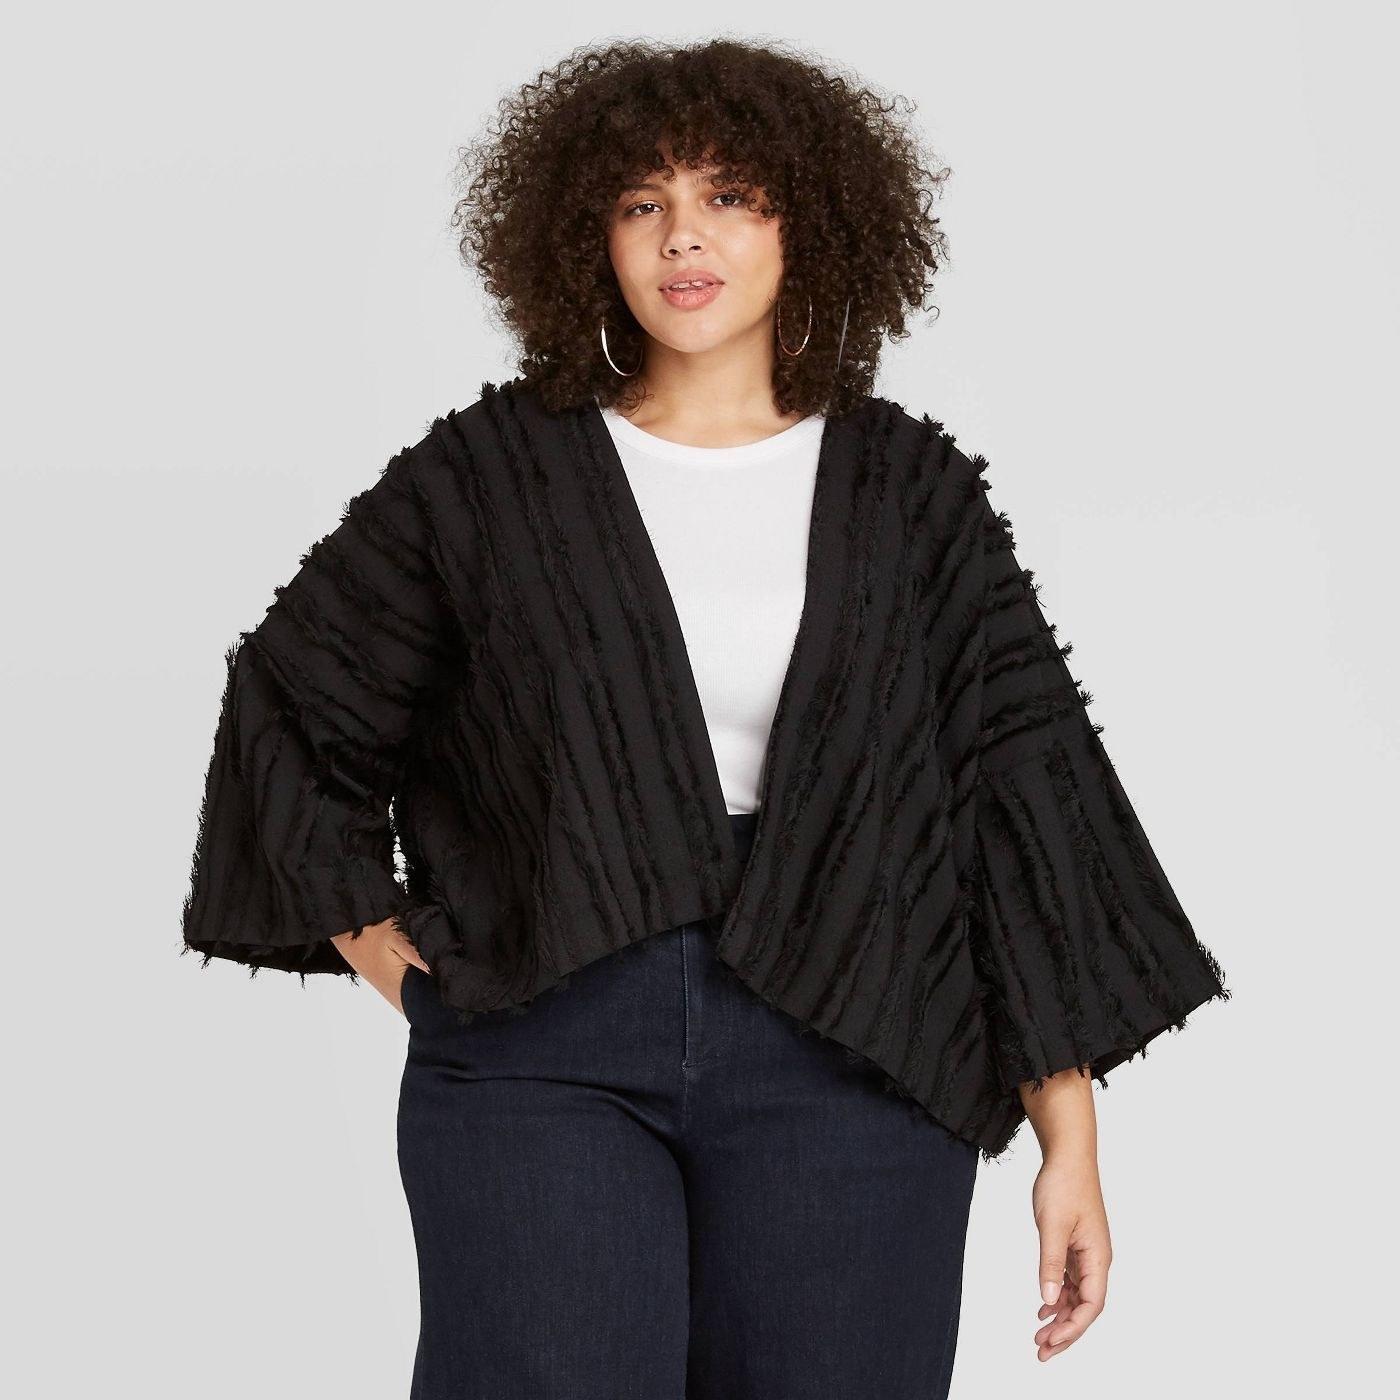 Model wearing black overcoat